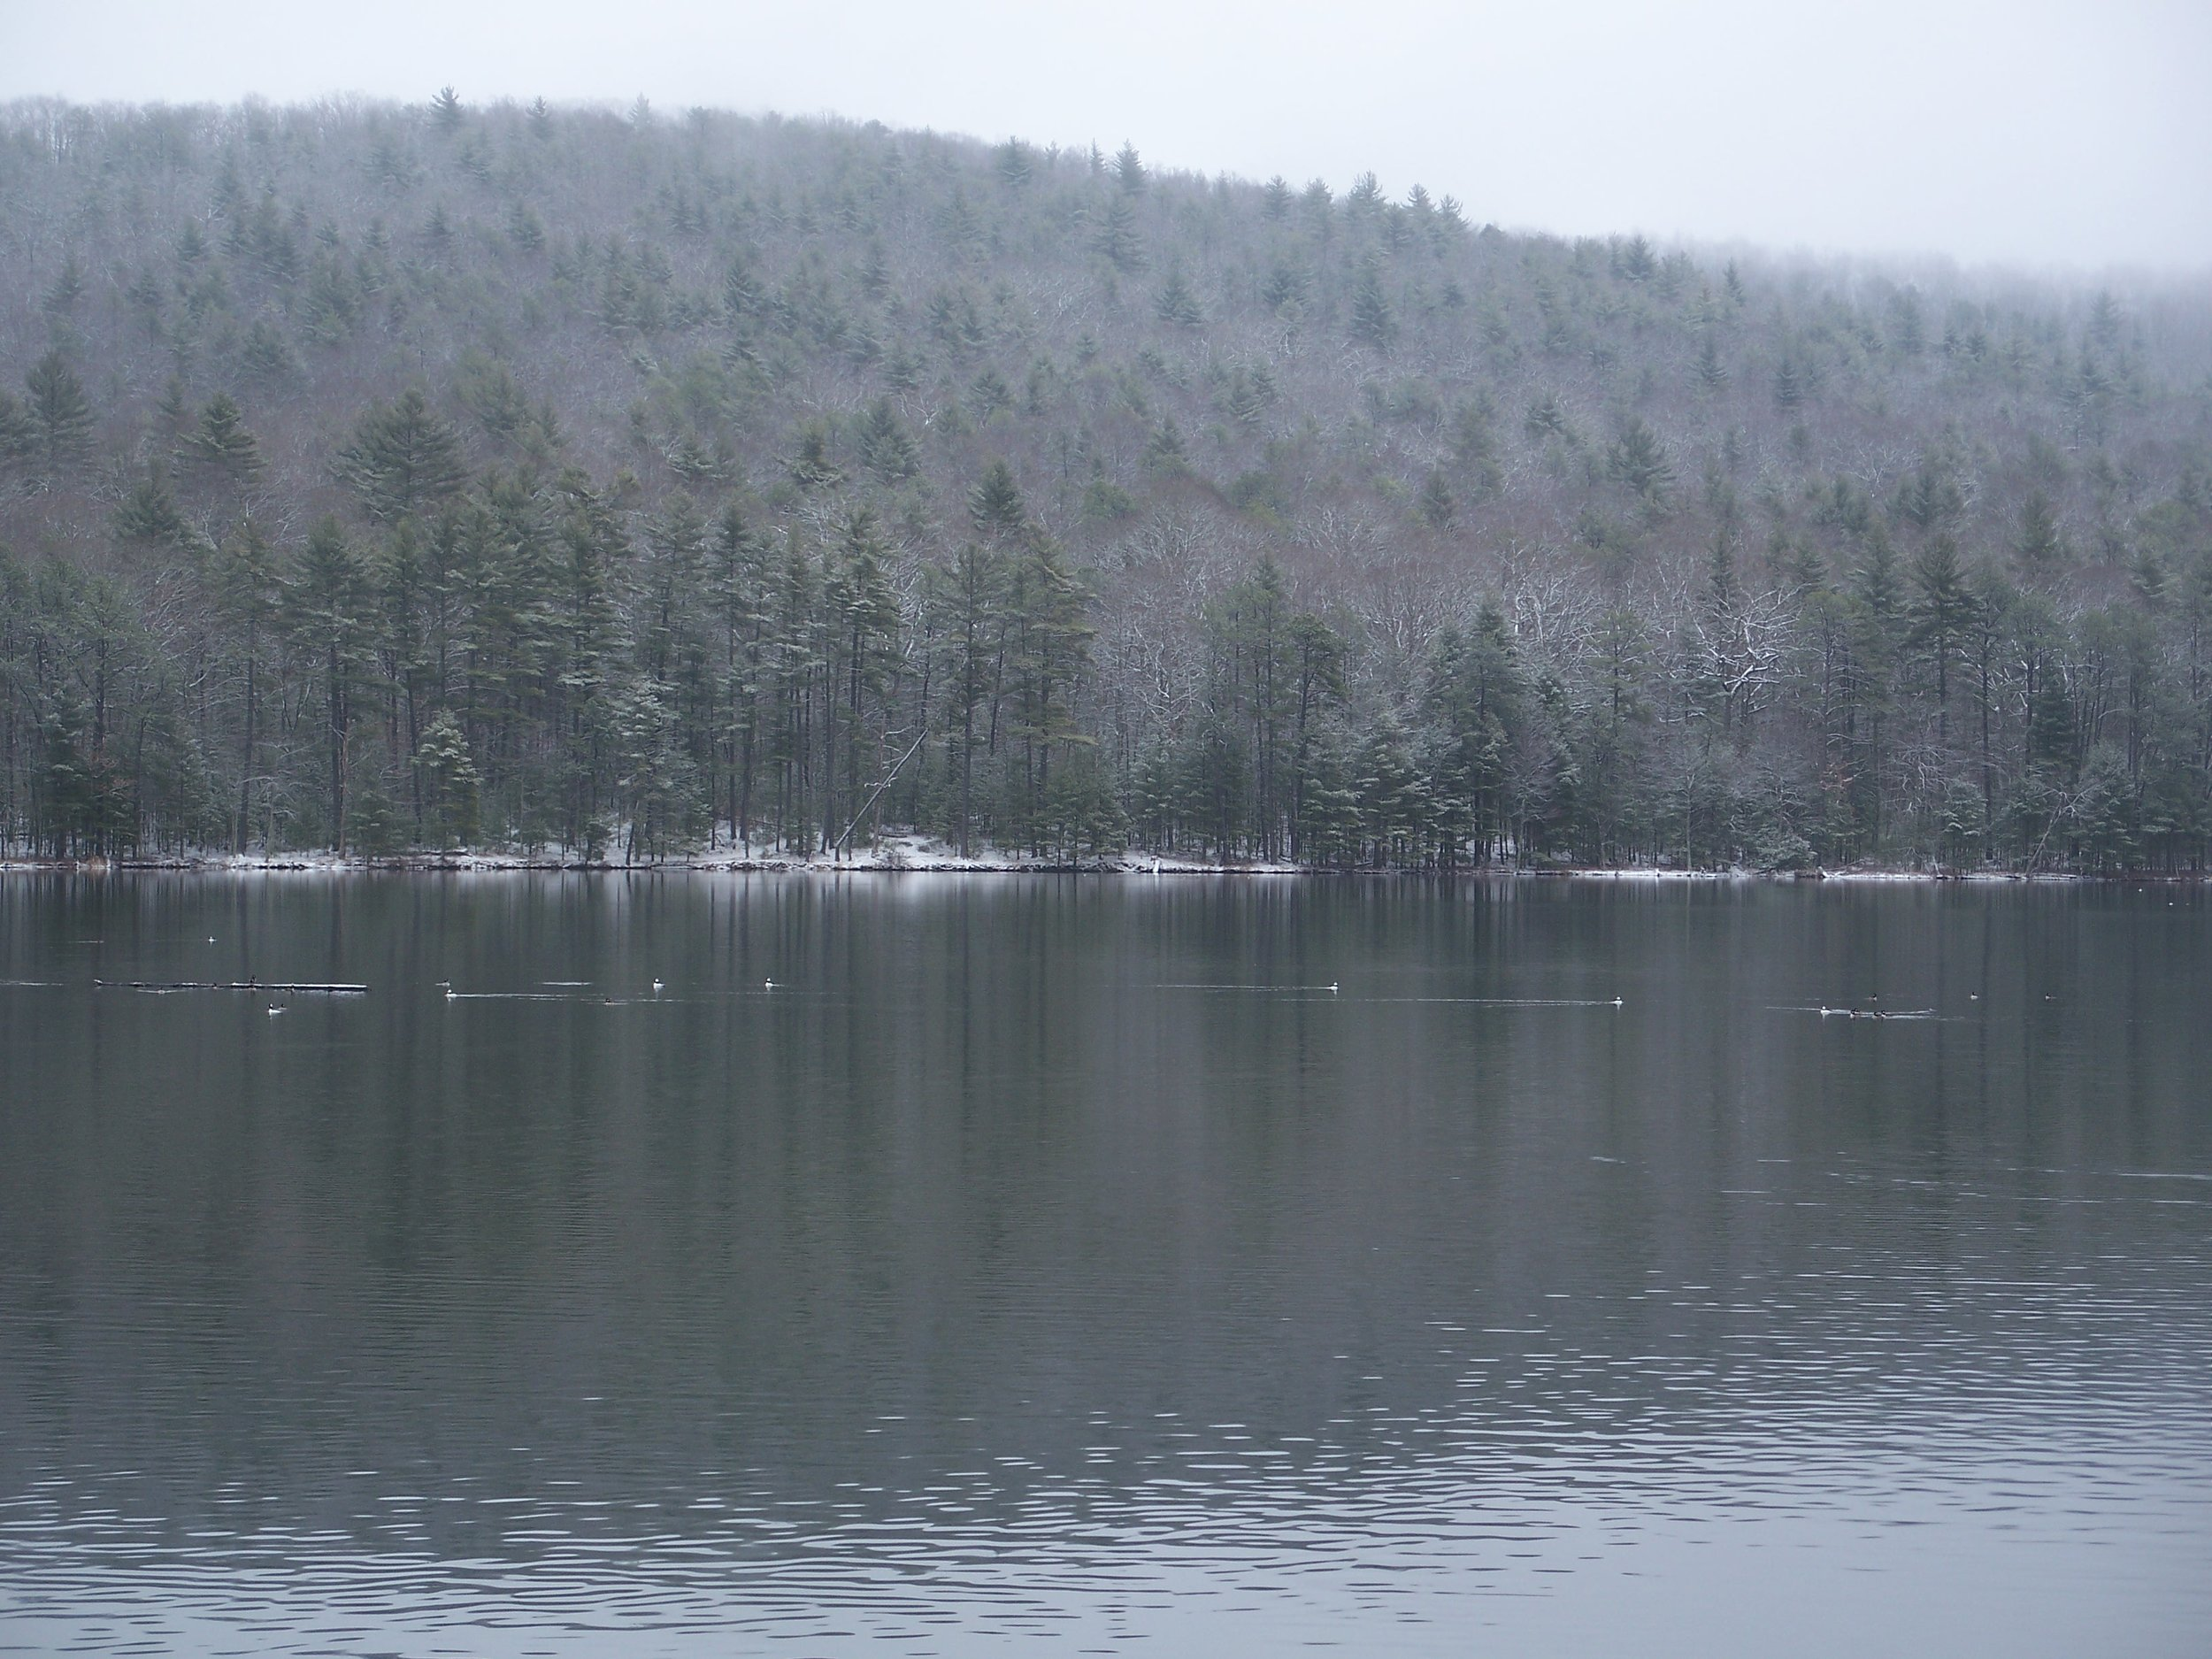 S3 Lake Sherwood Buffleheads - By Doug Wood